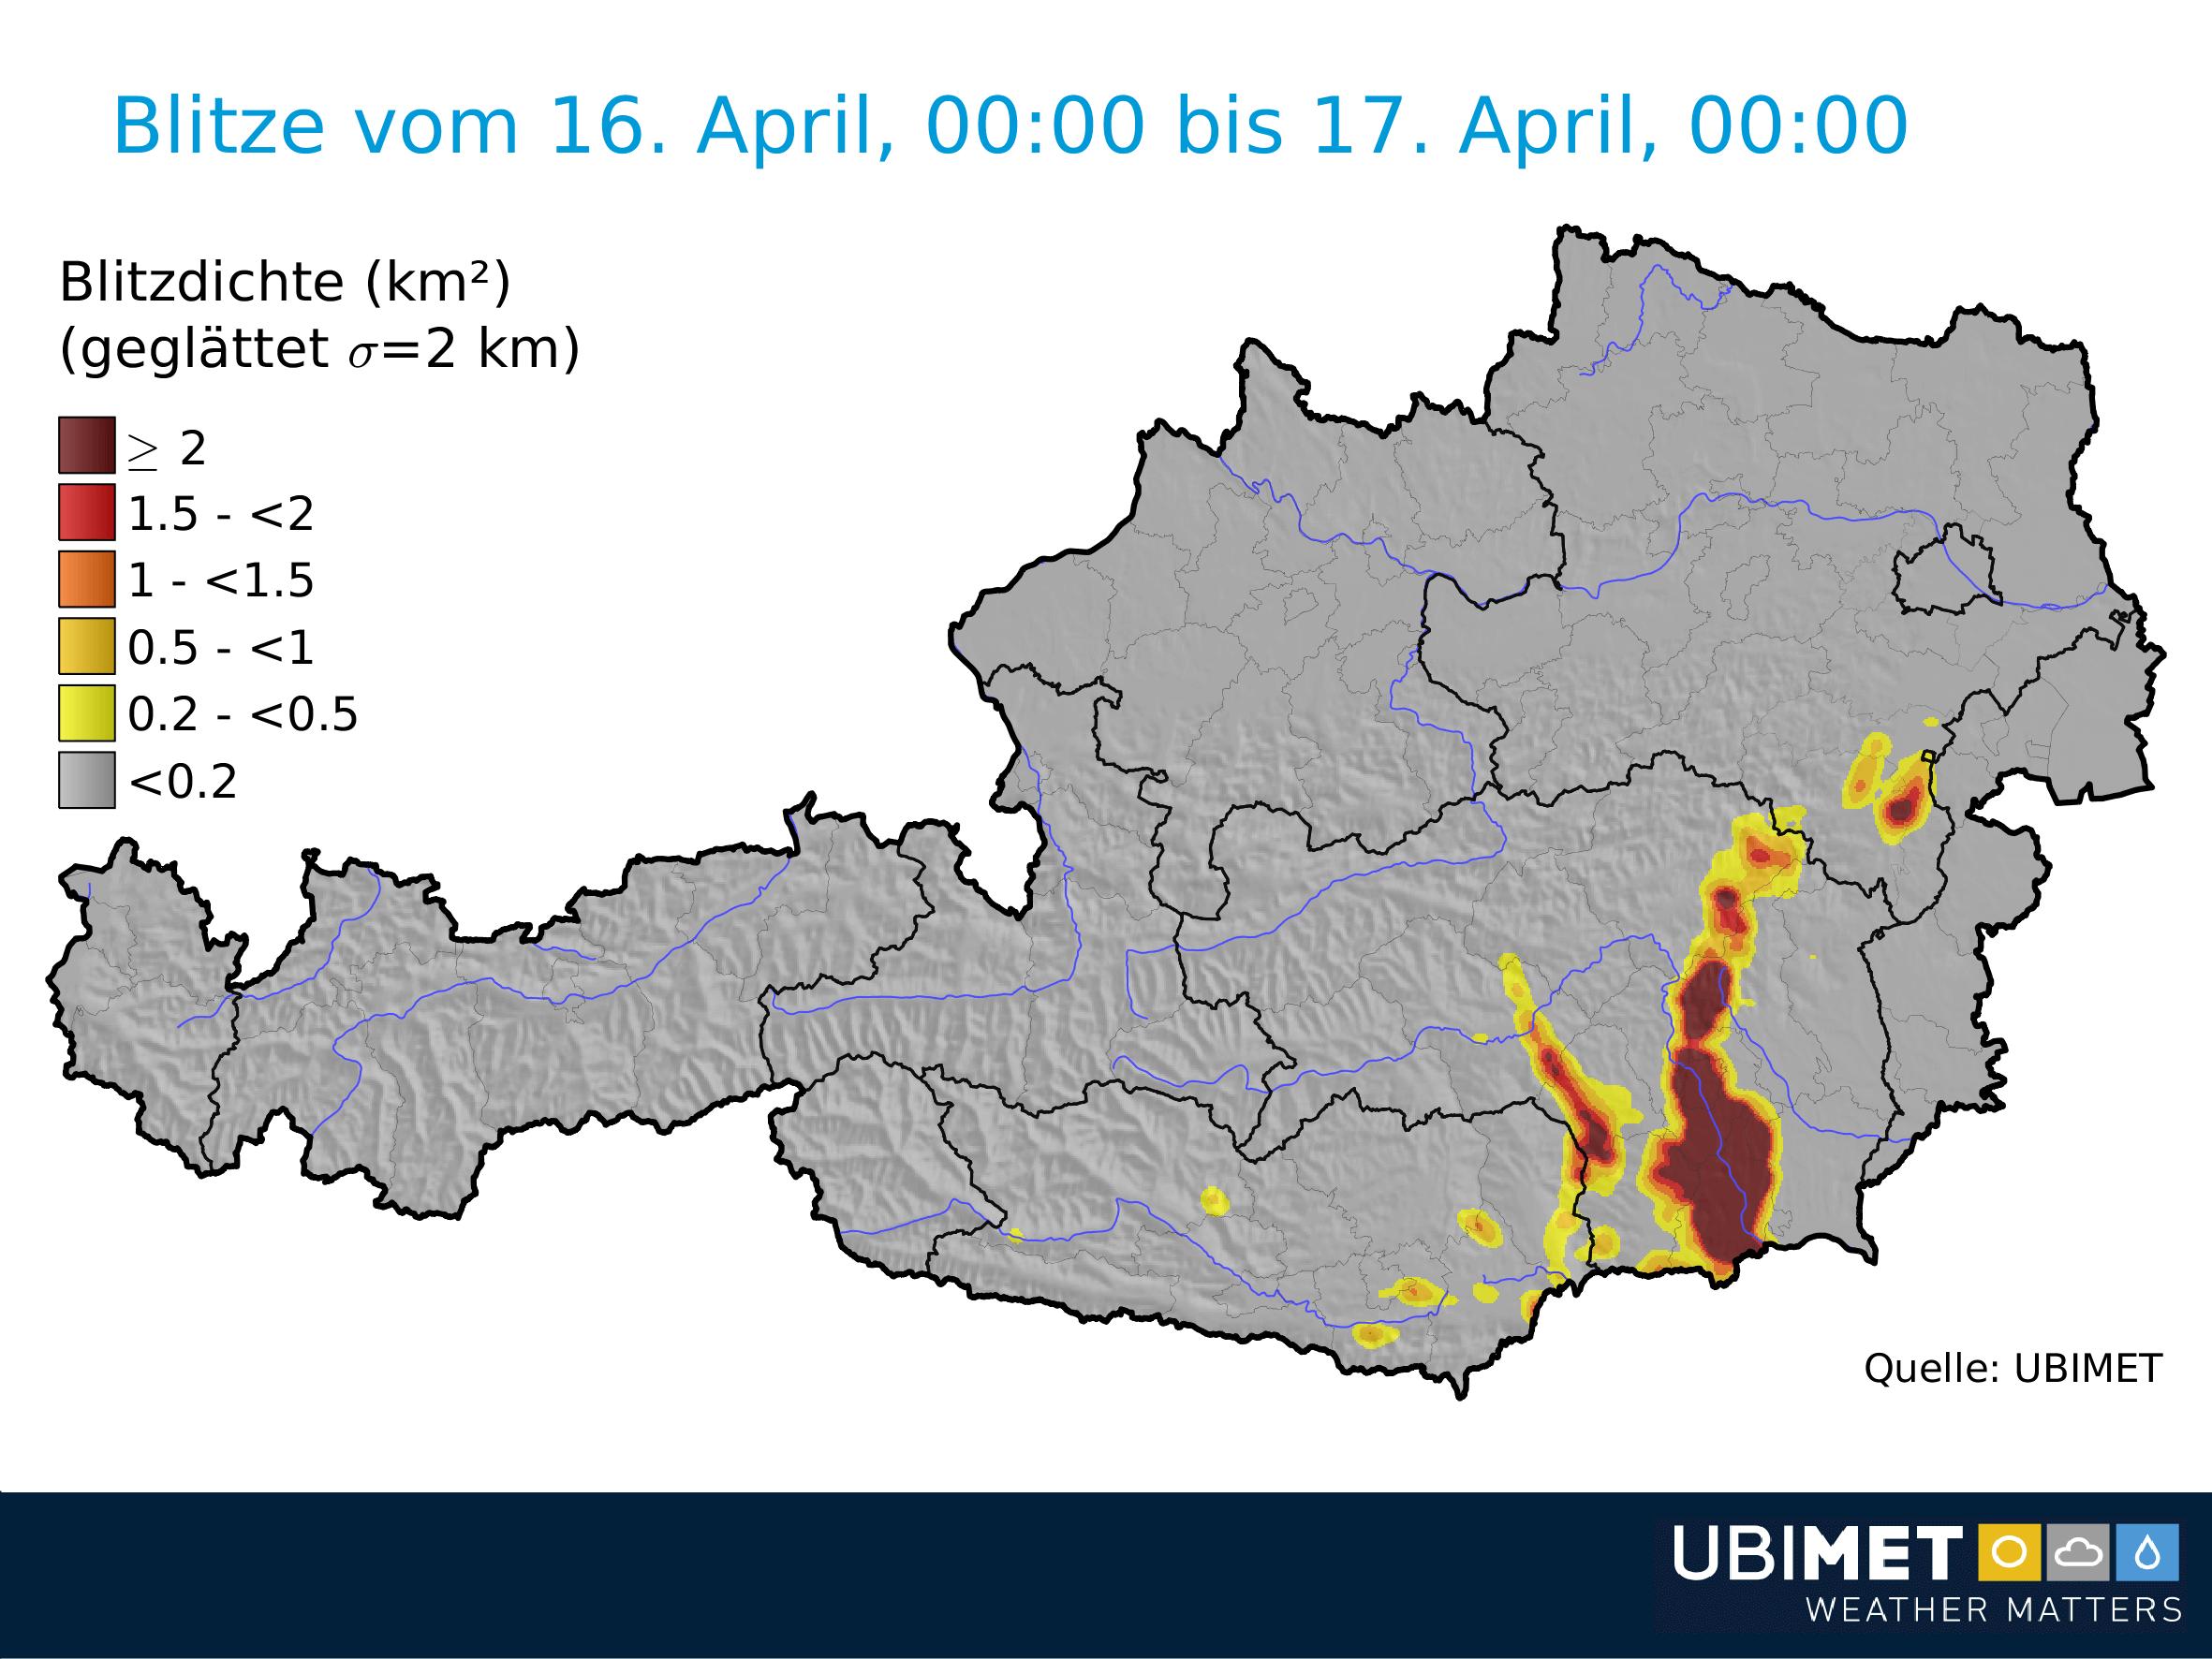 Blitze am Montag. © UBIMET